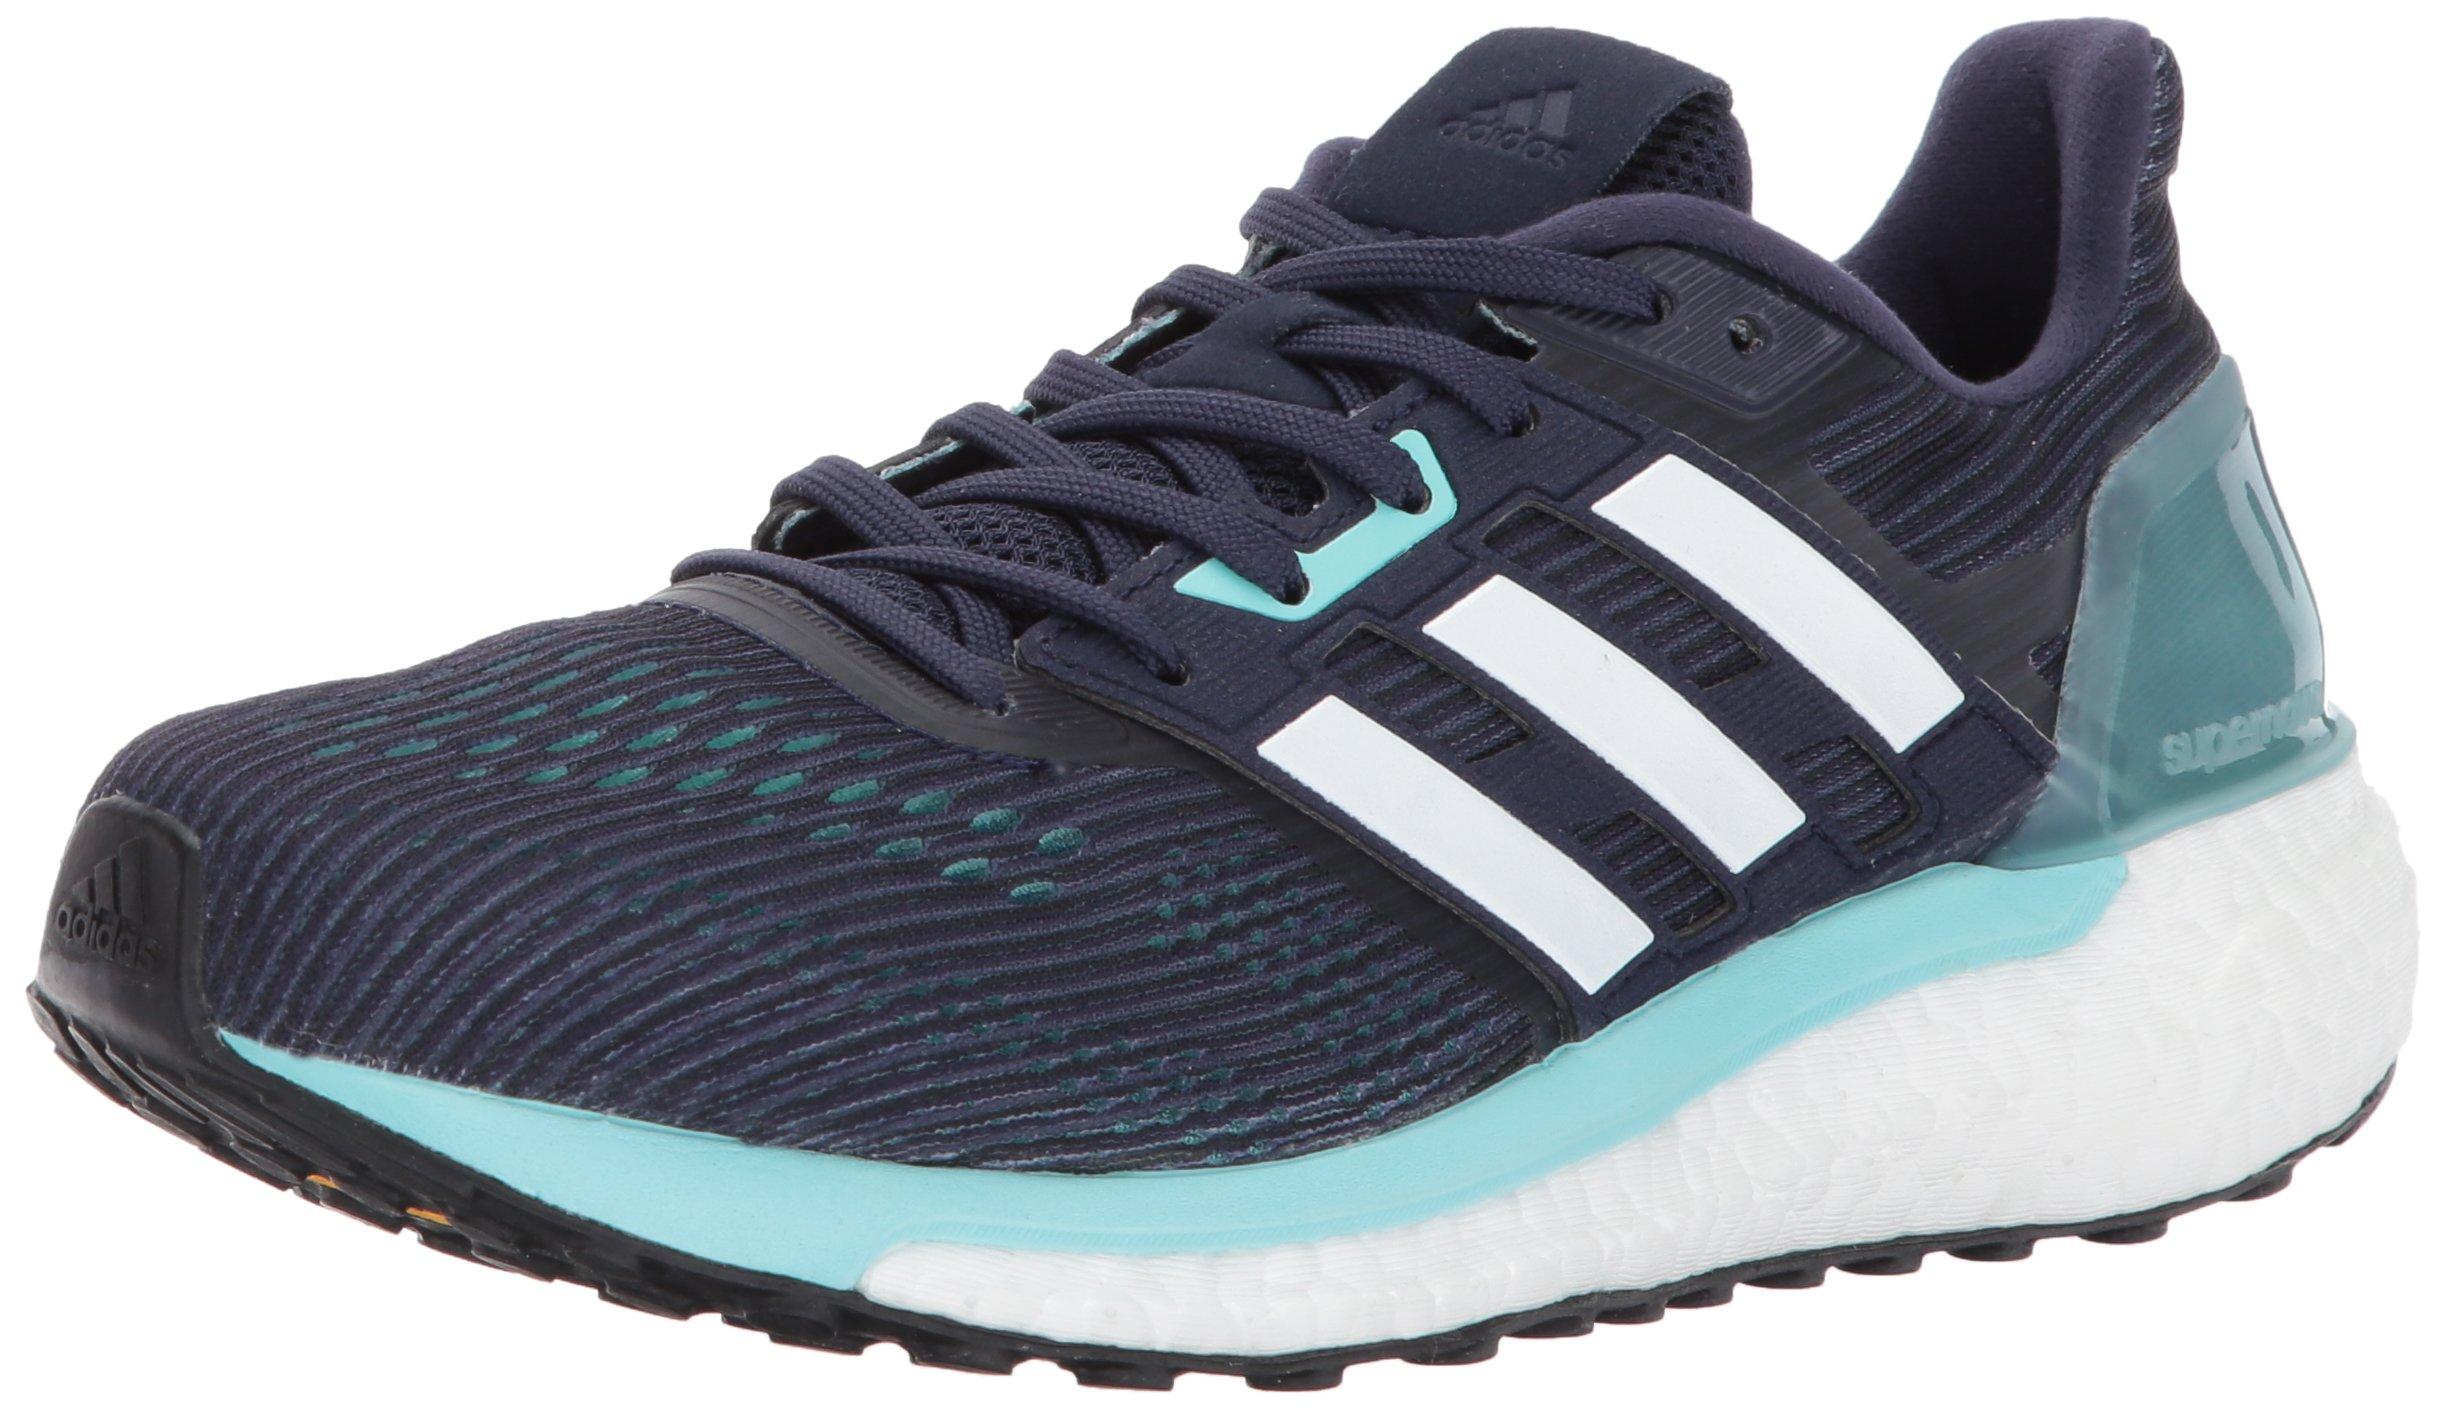 8a243661598 Galleon - Adidas Women s Supernova W Running Shoe